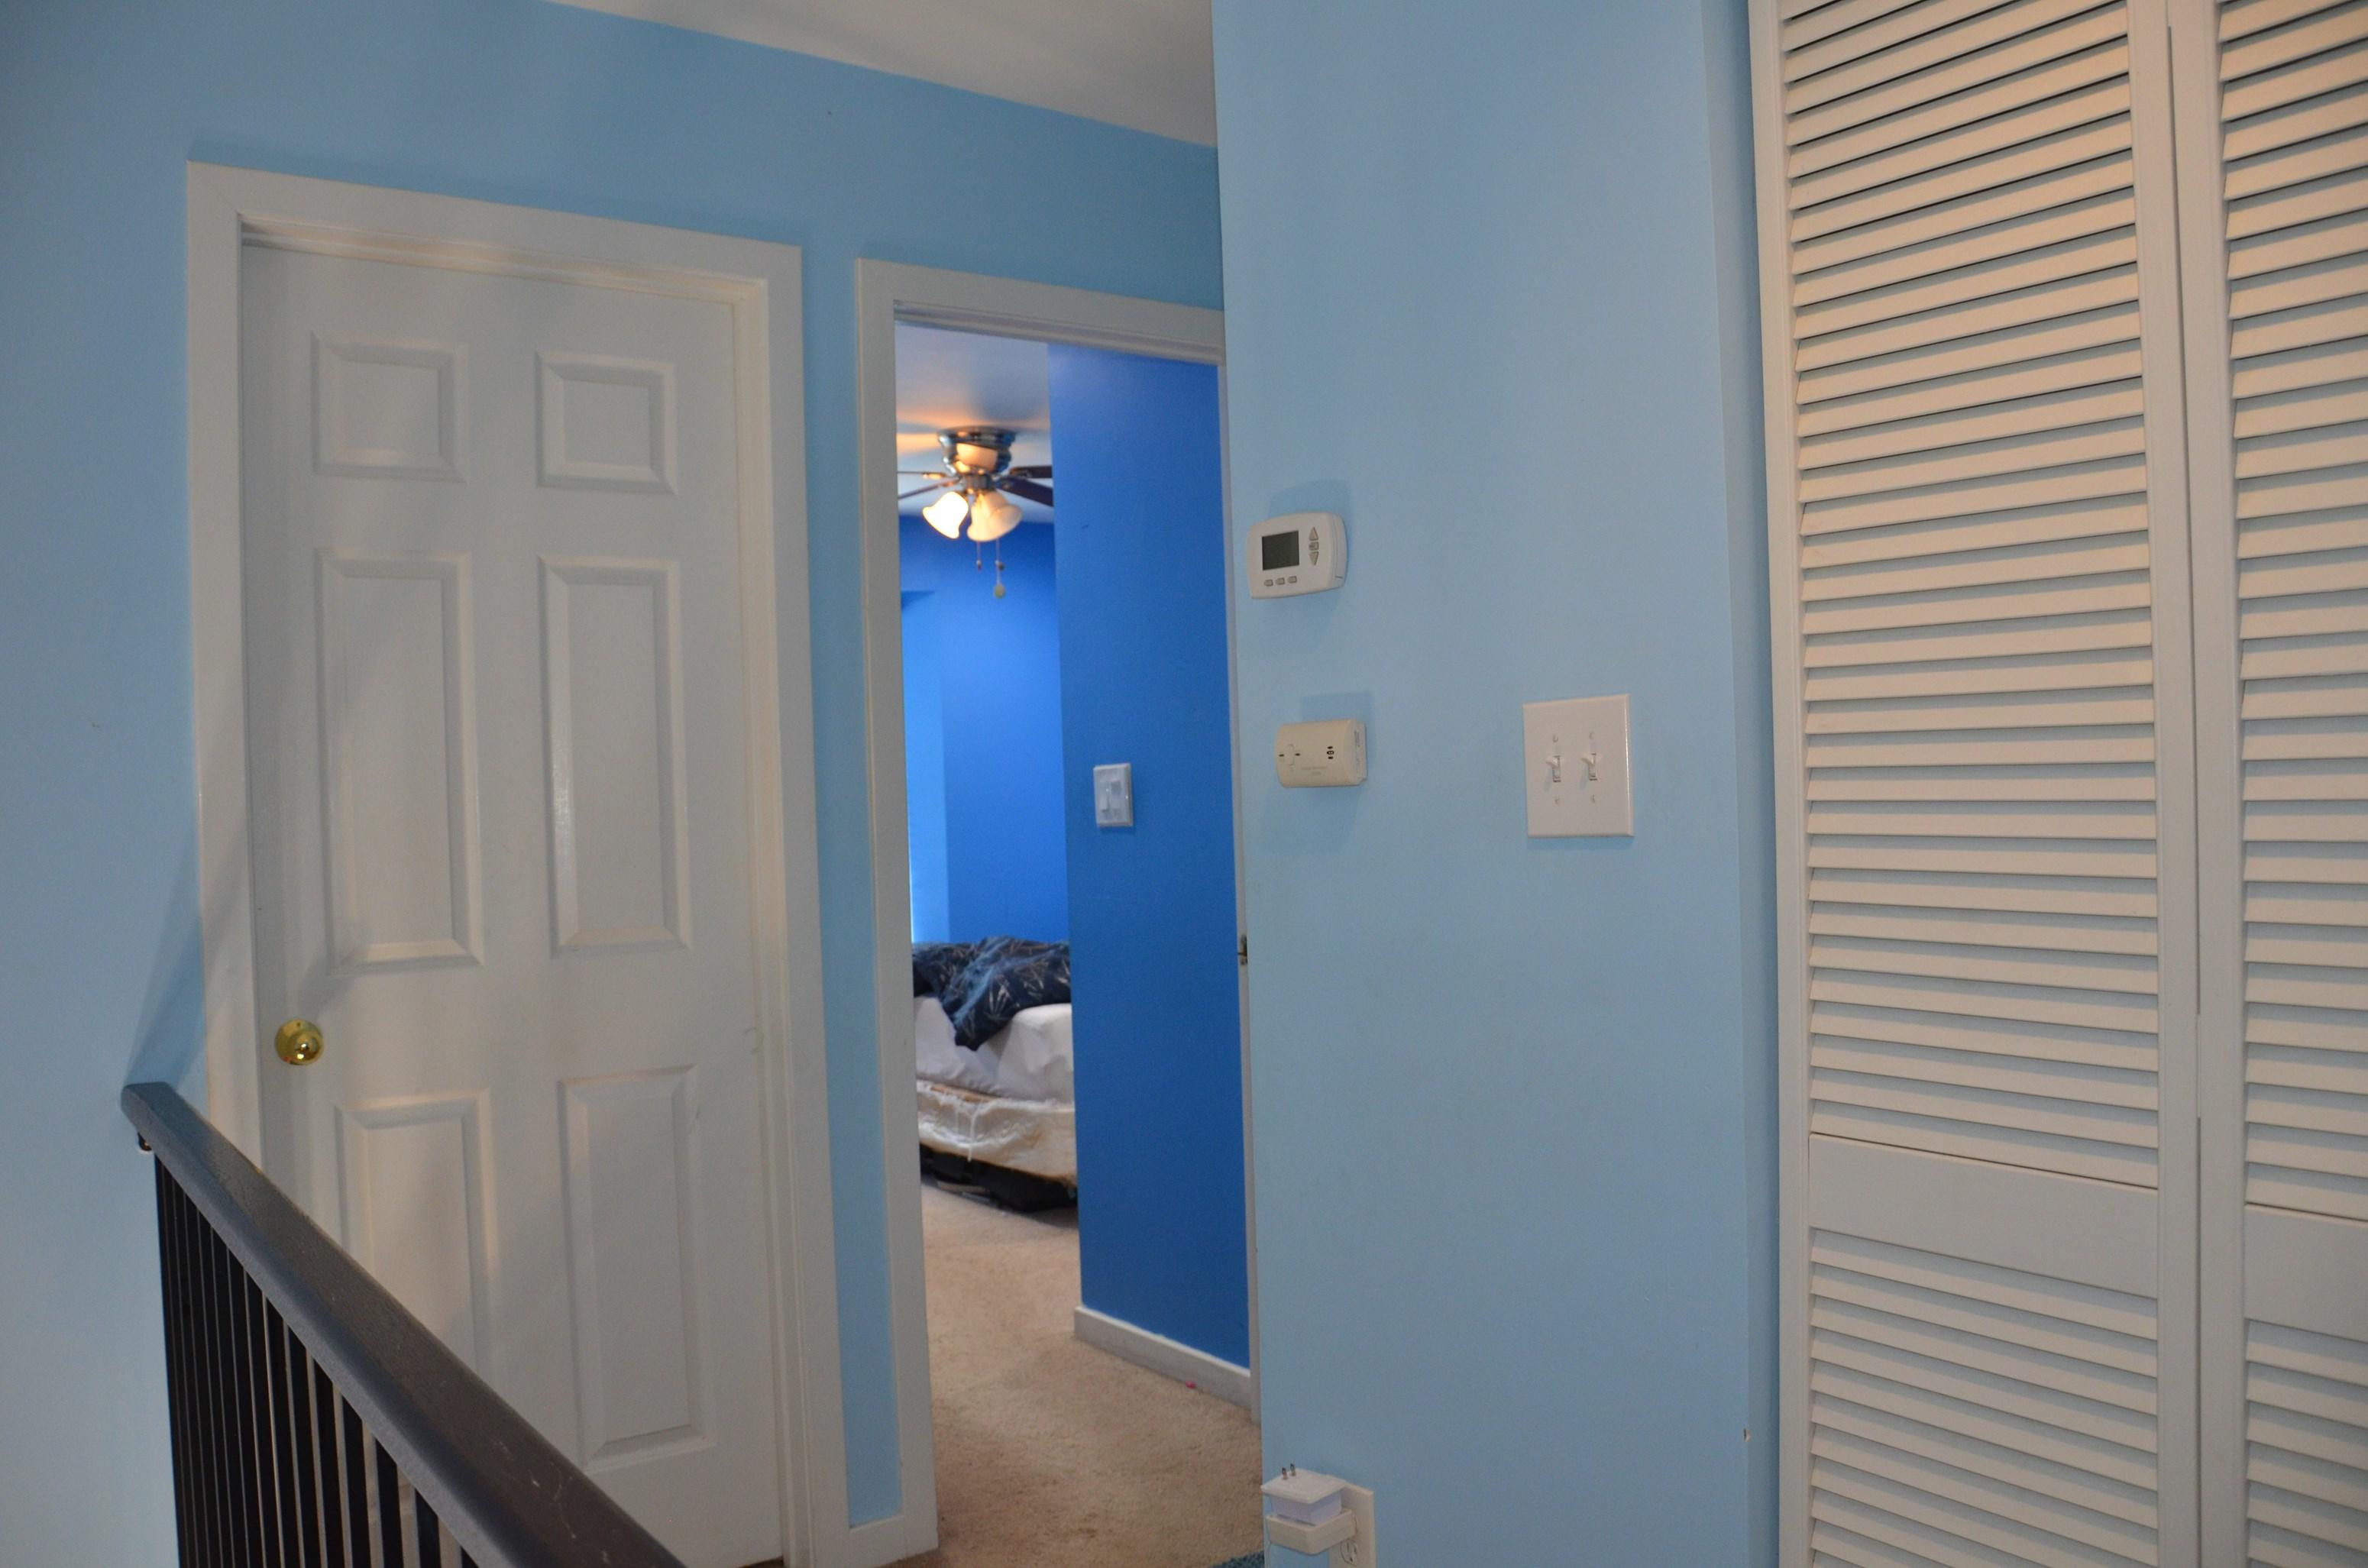 Rooms for Rent Basking Ridge, NJ – Apartments, House